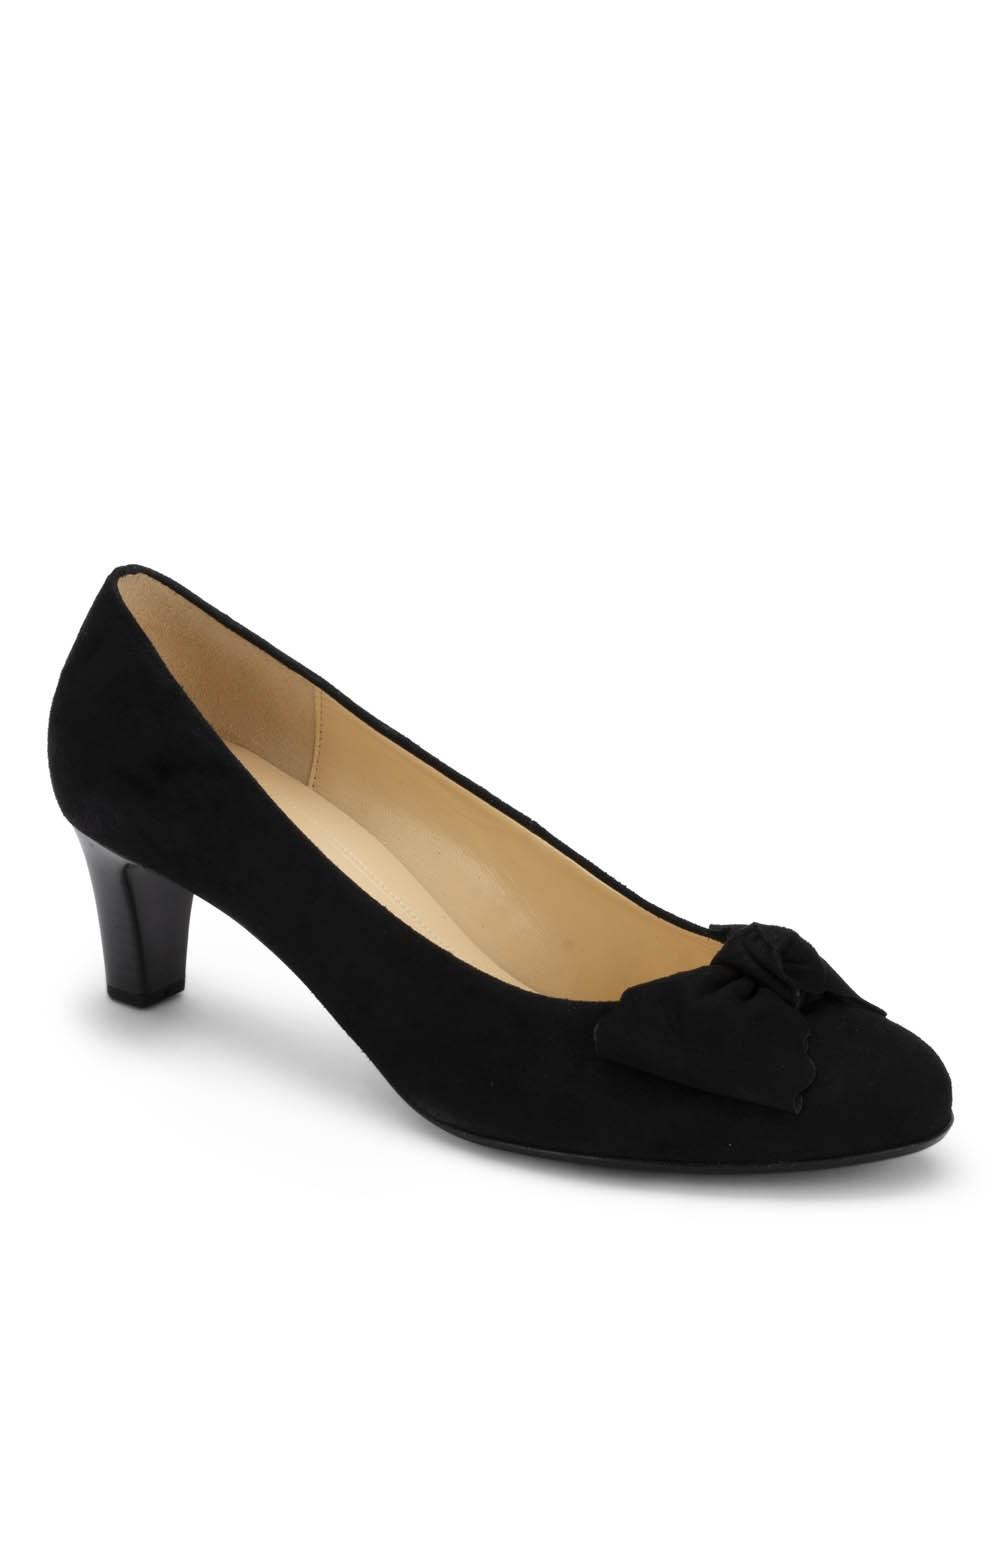 812024cd58ff0 Ladies Gabor Heeled Bow Shoe - House of Bruar